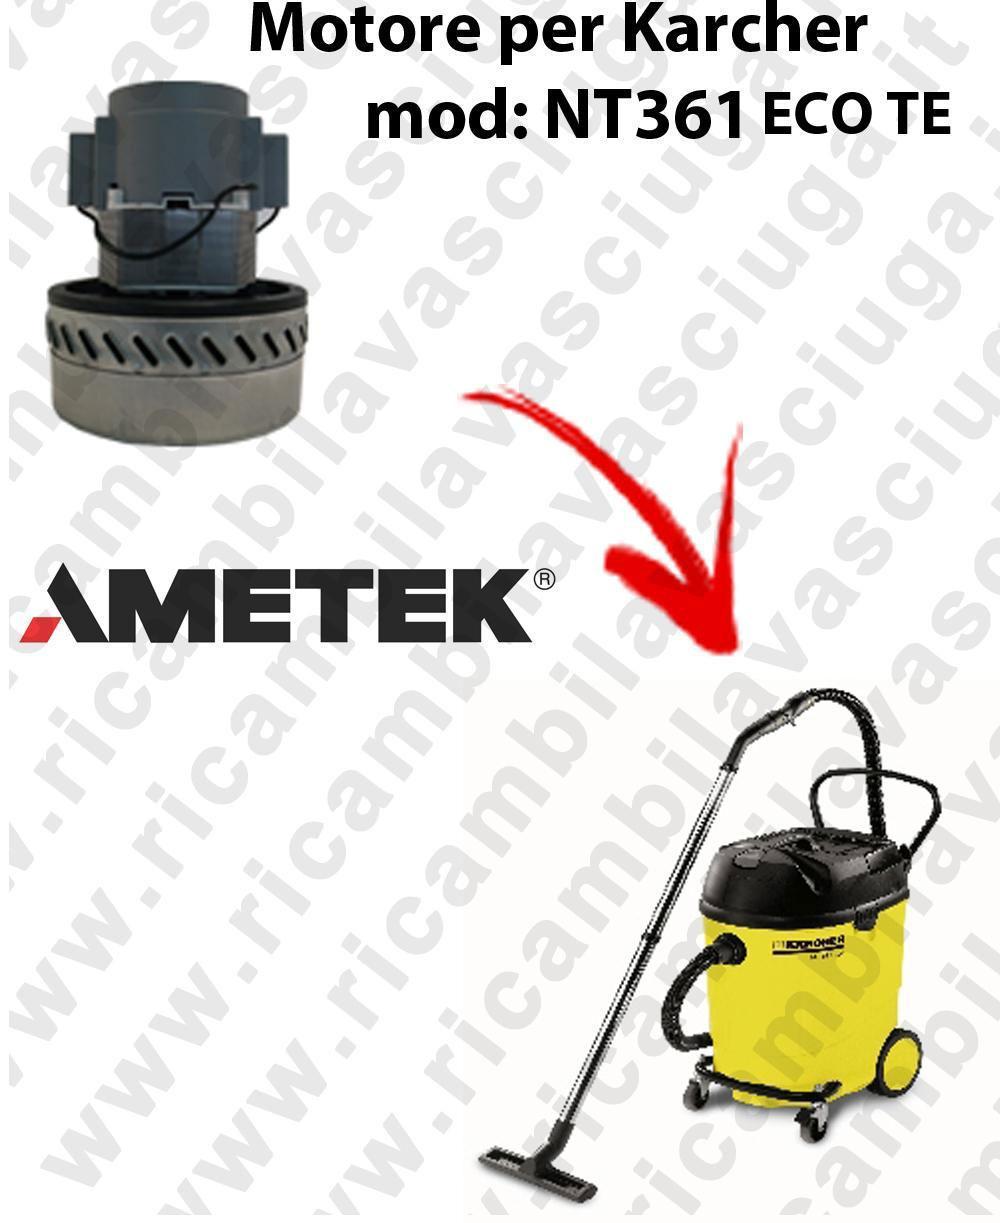 NT361 ECO TE Ametek Vacuum Motor  for vacuum cleaner KARCHER